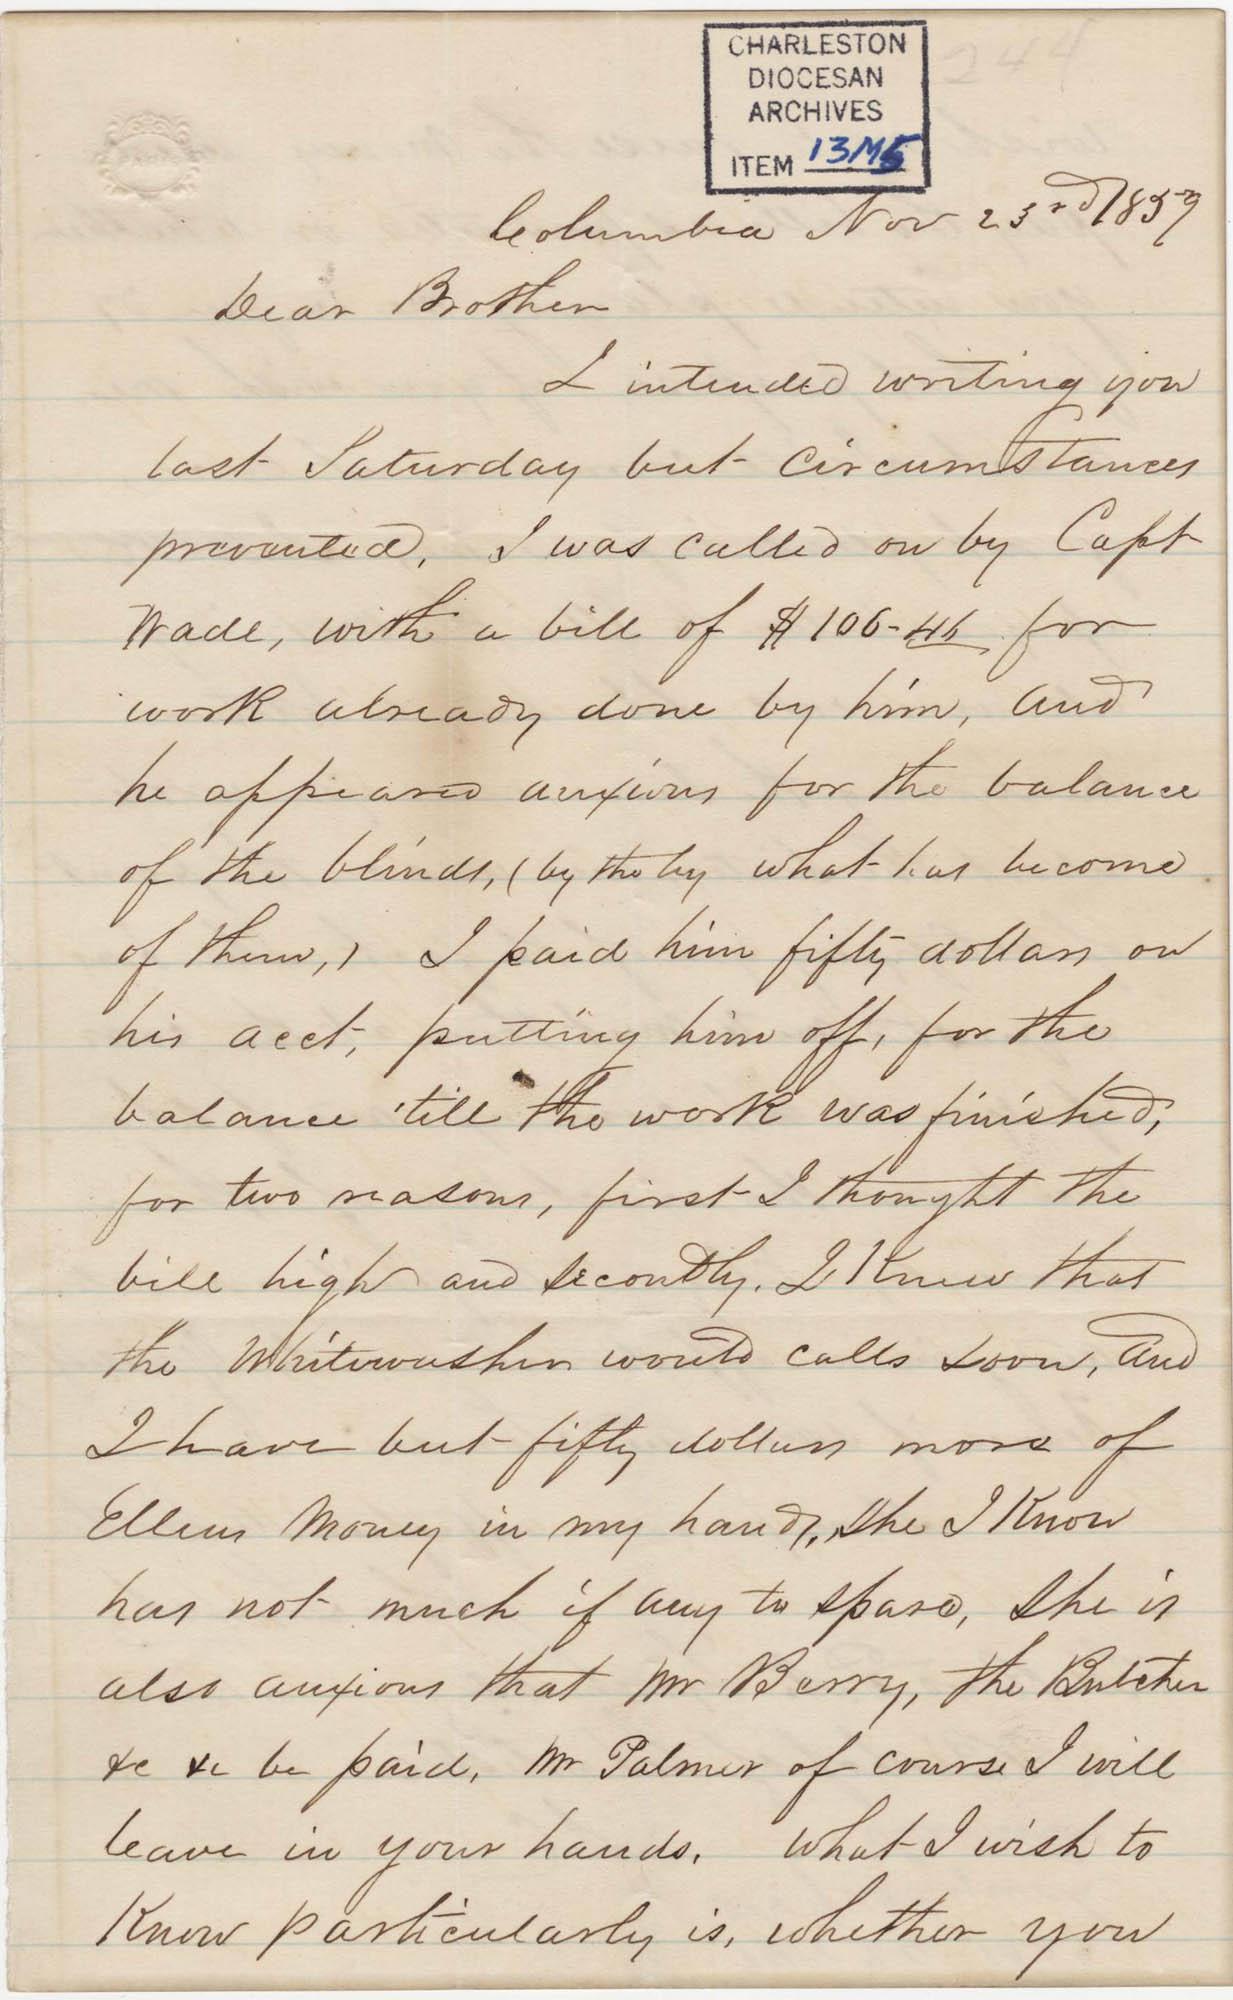 086. John Lynch to Bp Patrick Lynch -- November 23, 1859